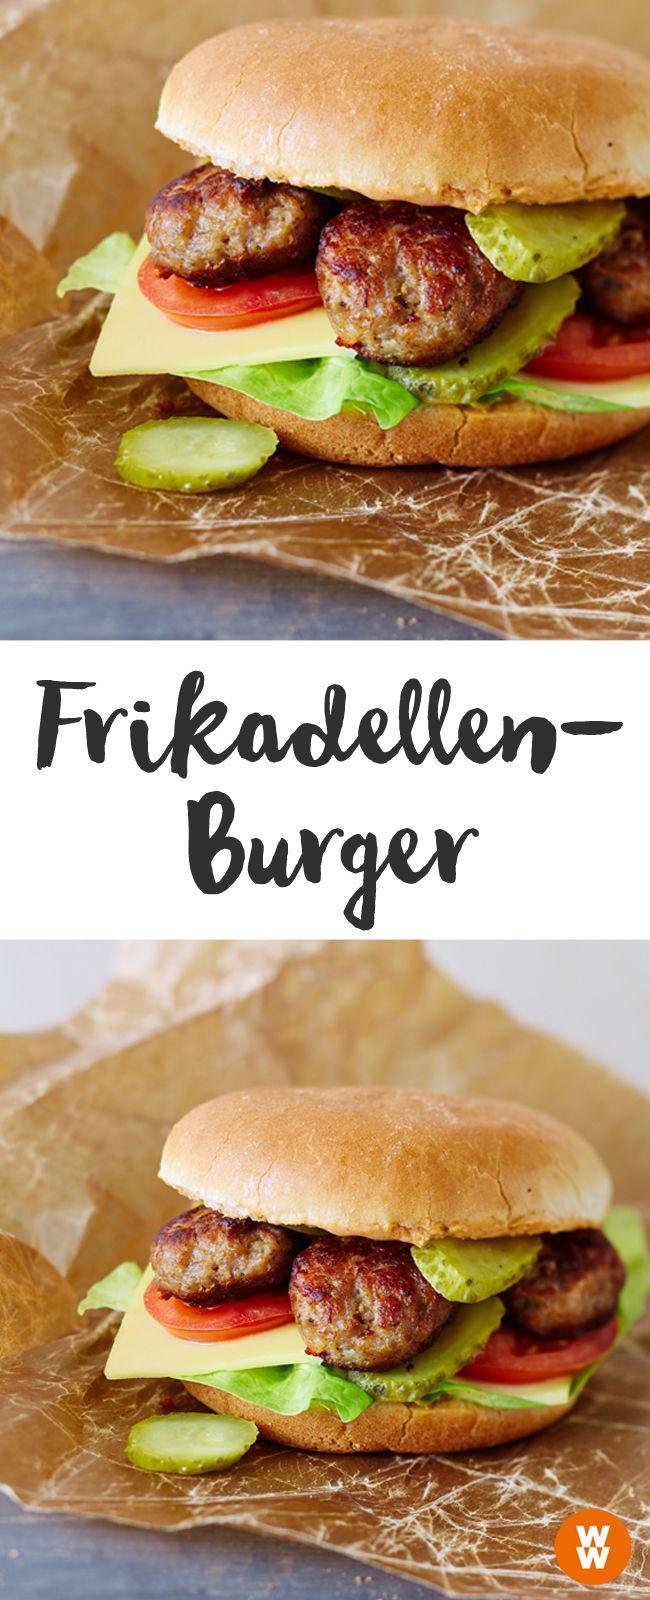 Würziger Frikadellen-Burger, Burger, Grill, Barbecue | Weight Watchers